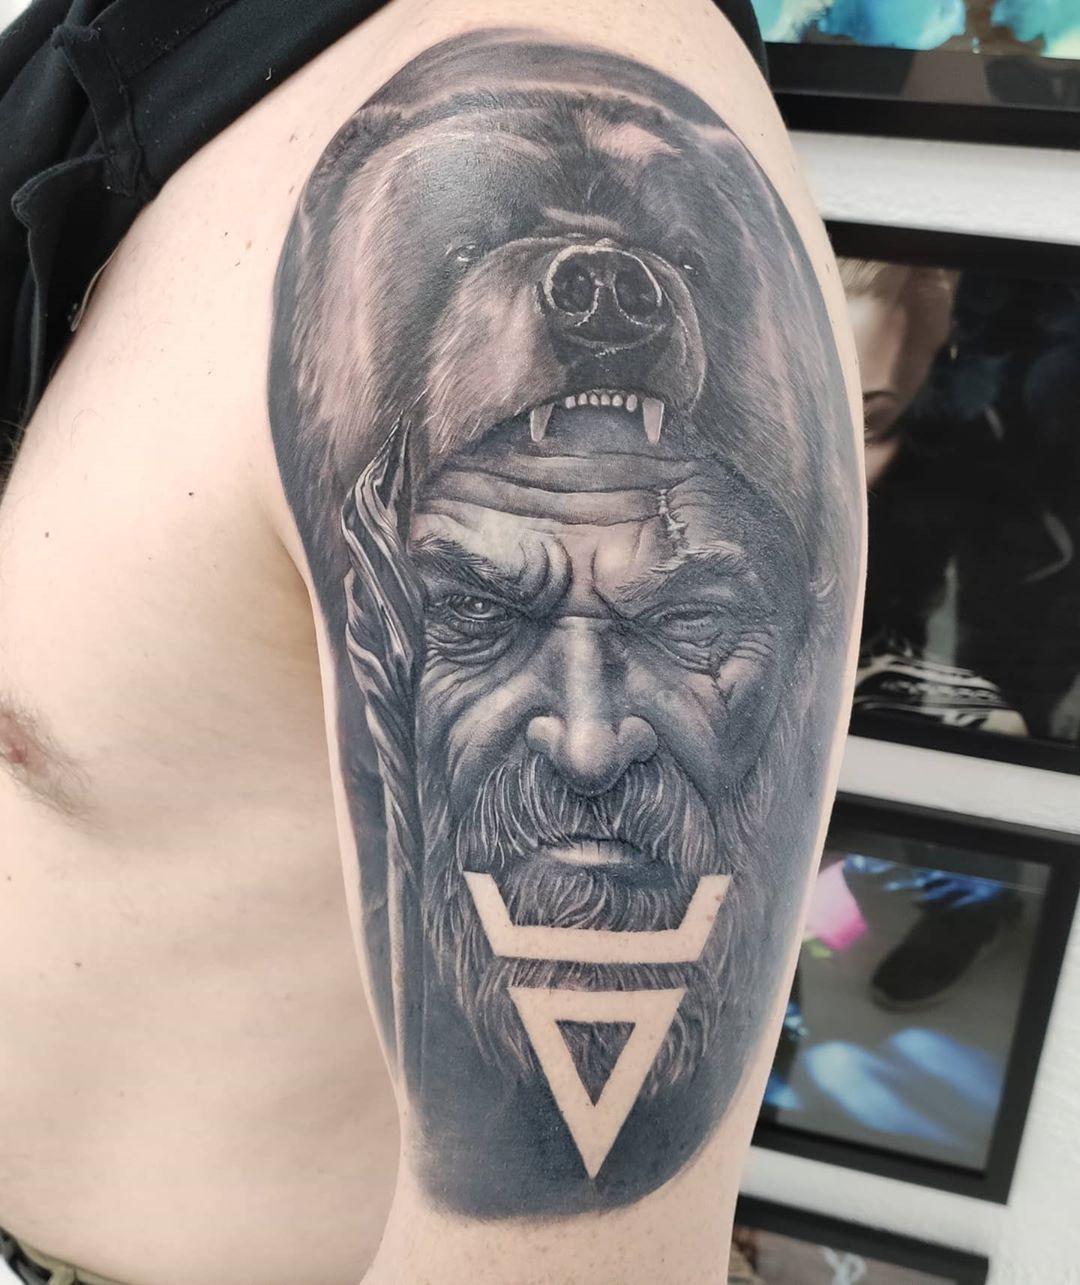 @tattoohubternopil @zabitaya_ukraina @ttk_ua @tattoo_masters_ukraine @fkirons #wordfamousink #tattooart #tattooartist #tattoo # #kwadron #kwadronneedles #tattooing #tattooink #татутернопіль #тернопіль #капітанрукожоп #tattoolife #tattoist #instaart #instatattoo #sleevetattoo #blackandgrey #blackandgreytattoos  #realistictattoo #tattoooftheday #tattoodo #tattooist #realistictattoo #bear #beartattoo #animals #saveanimals #realismtattoo